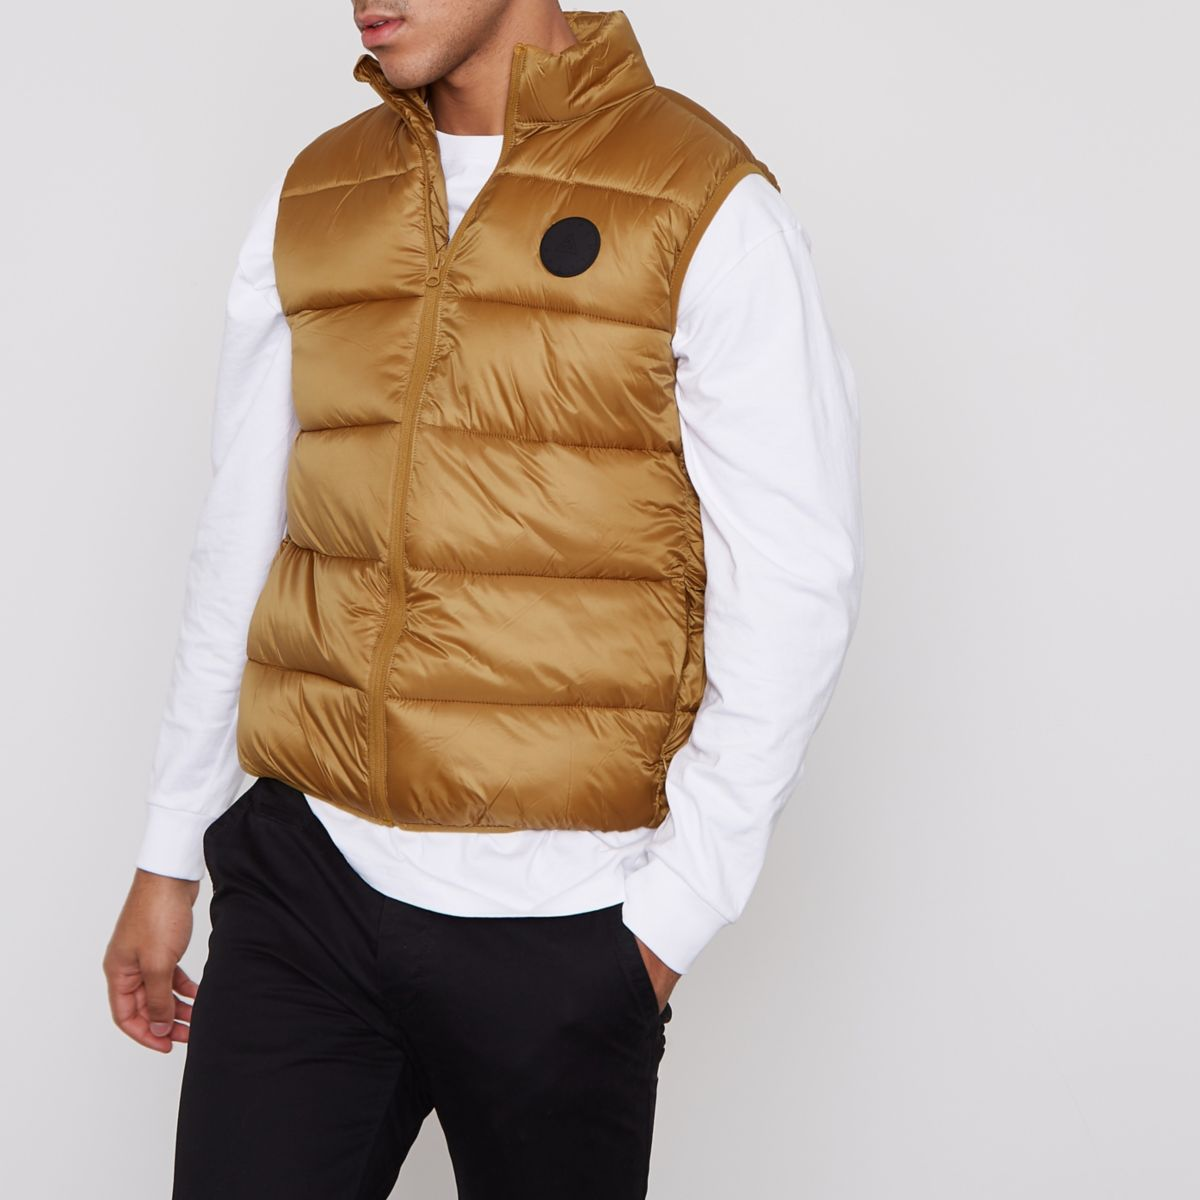 Mustard yellow puffer vest